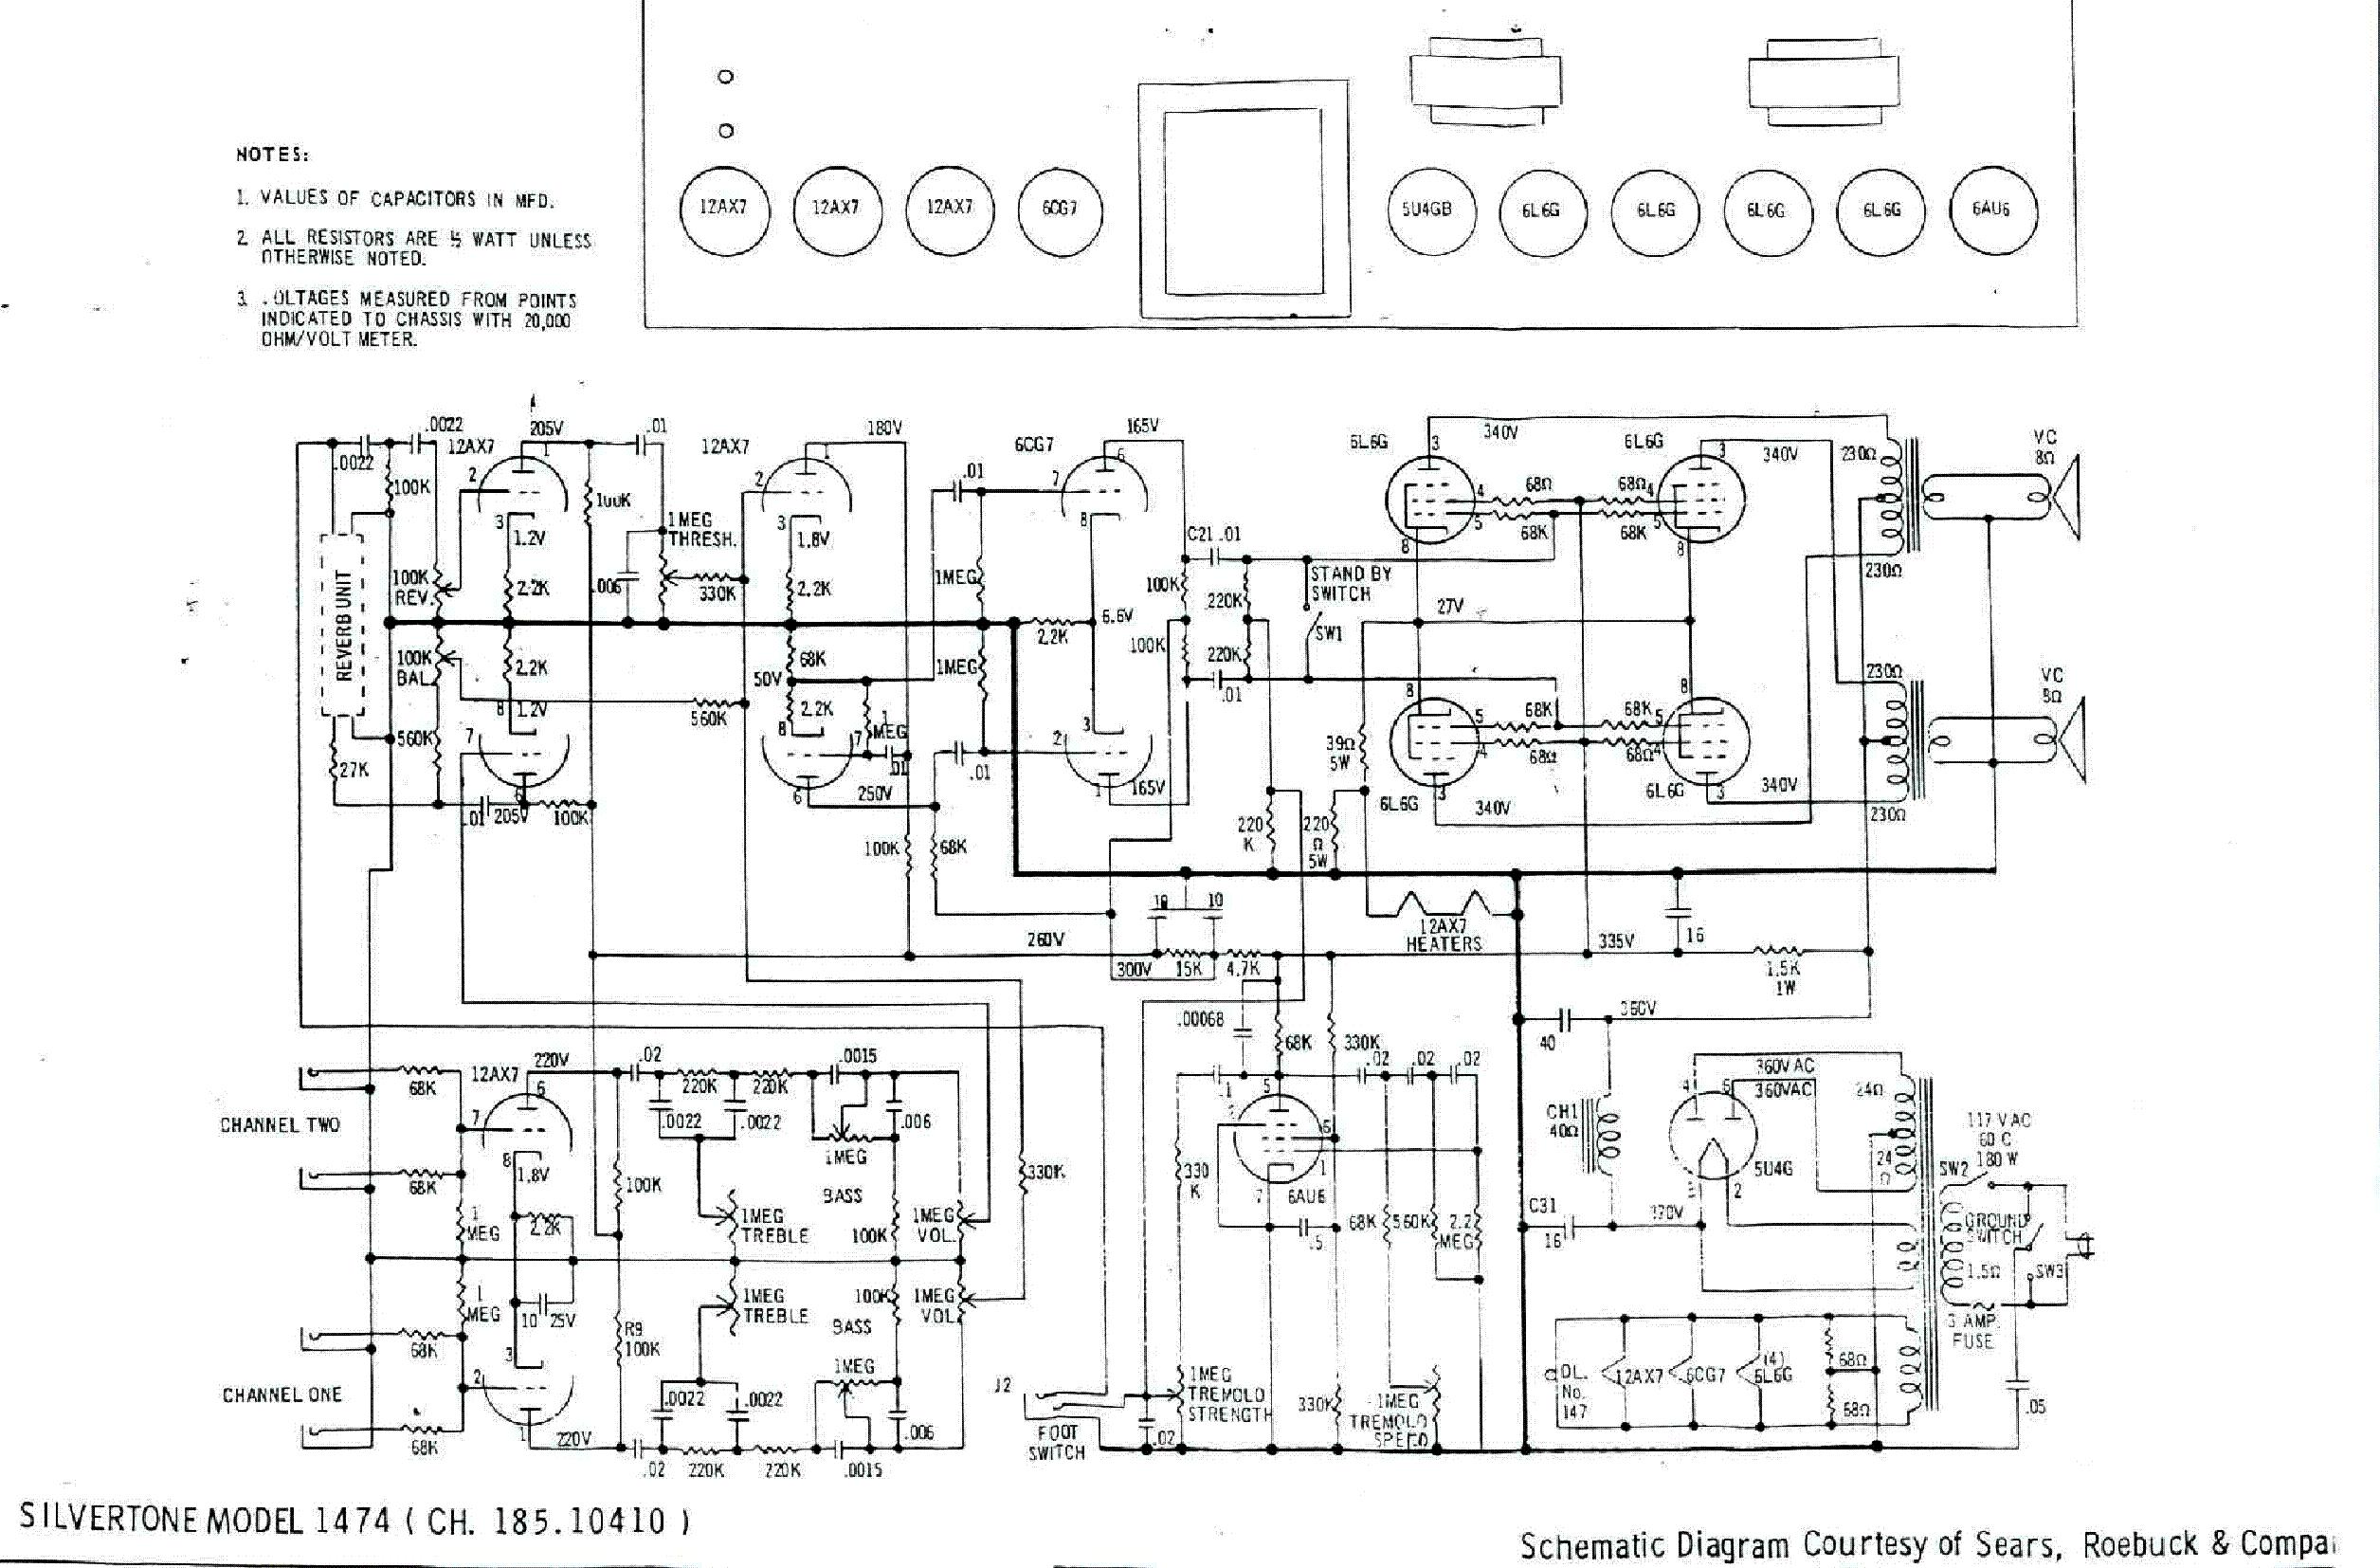 [SCHEMATICS_48DE]  ☑ Vintage Silvertone Console Wiring Diagram HD Quality ☑ circuits-and-logic- diagram.twirlinglucca.it | Vintage Silvertone Console Wiring Diagram |  | Diagram Database - Twirlinglucca.it